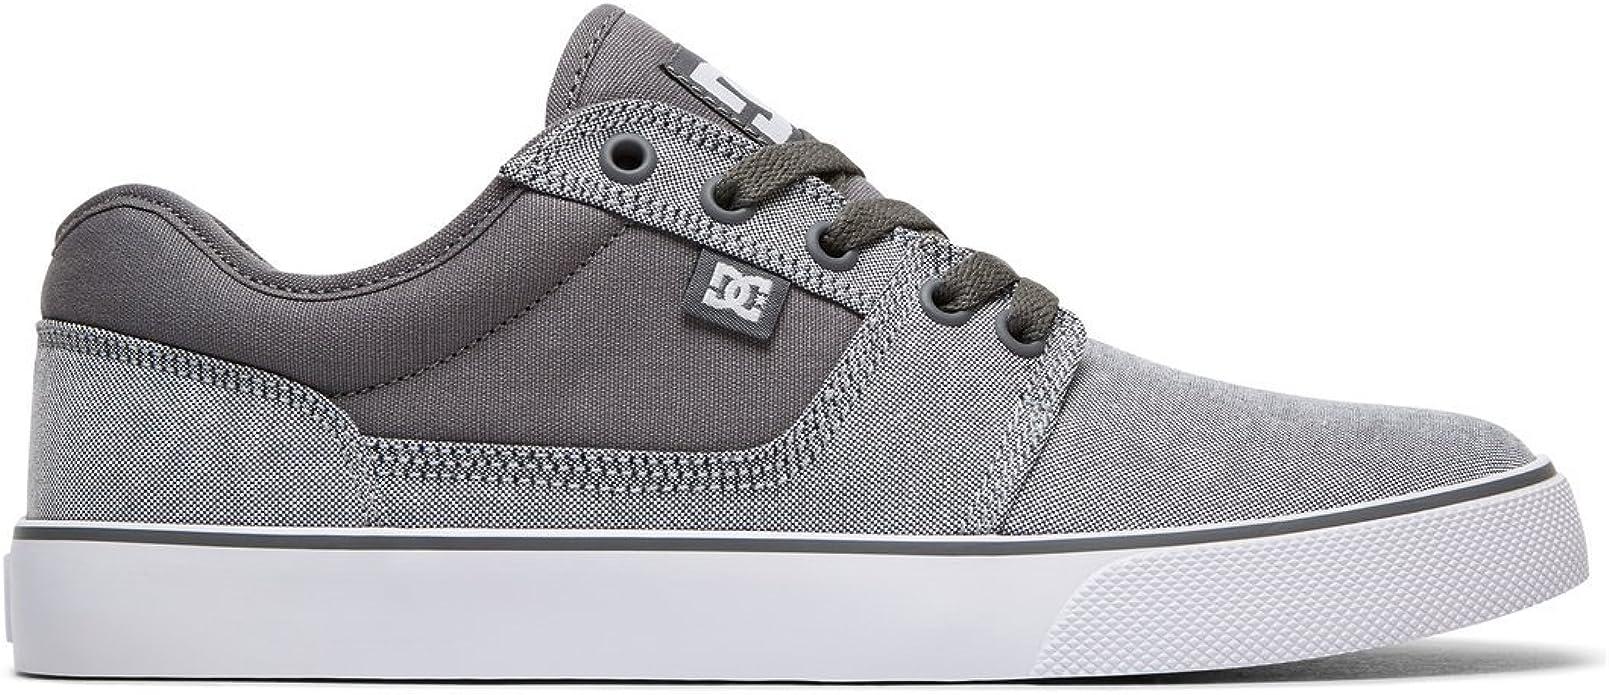 DC Shoes Tonik TX SE Sneakers Skateschuhe Herren Dunkelgrau/Hellgrau